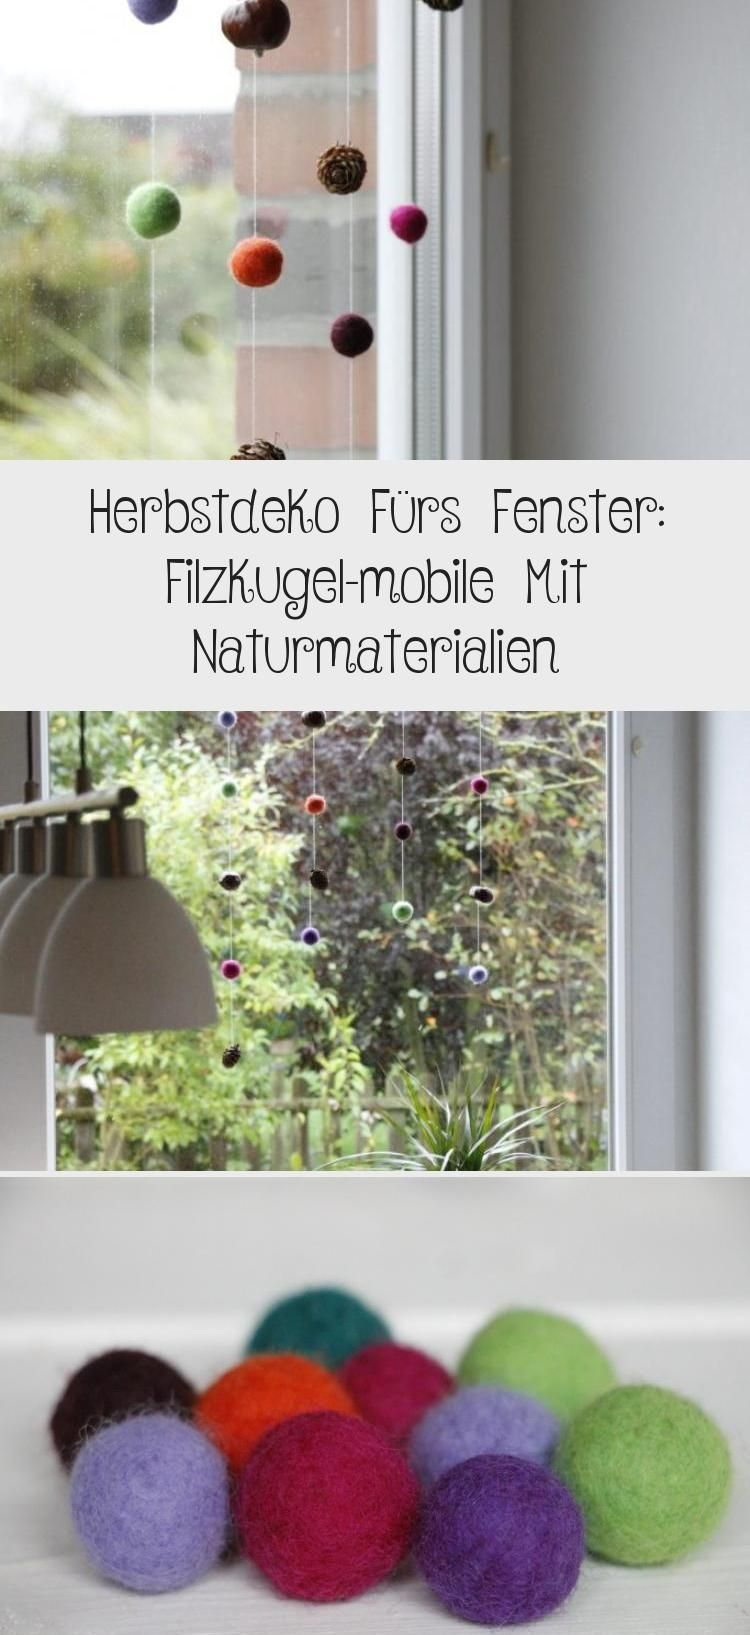 Herbstdeko Fürs Fenster: Filzkugel-mobile Mit Naturmaterialien #herbstfensterdekokinder